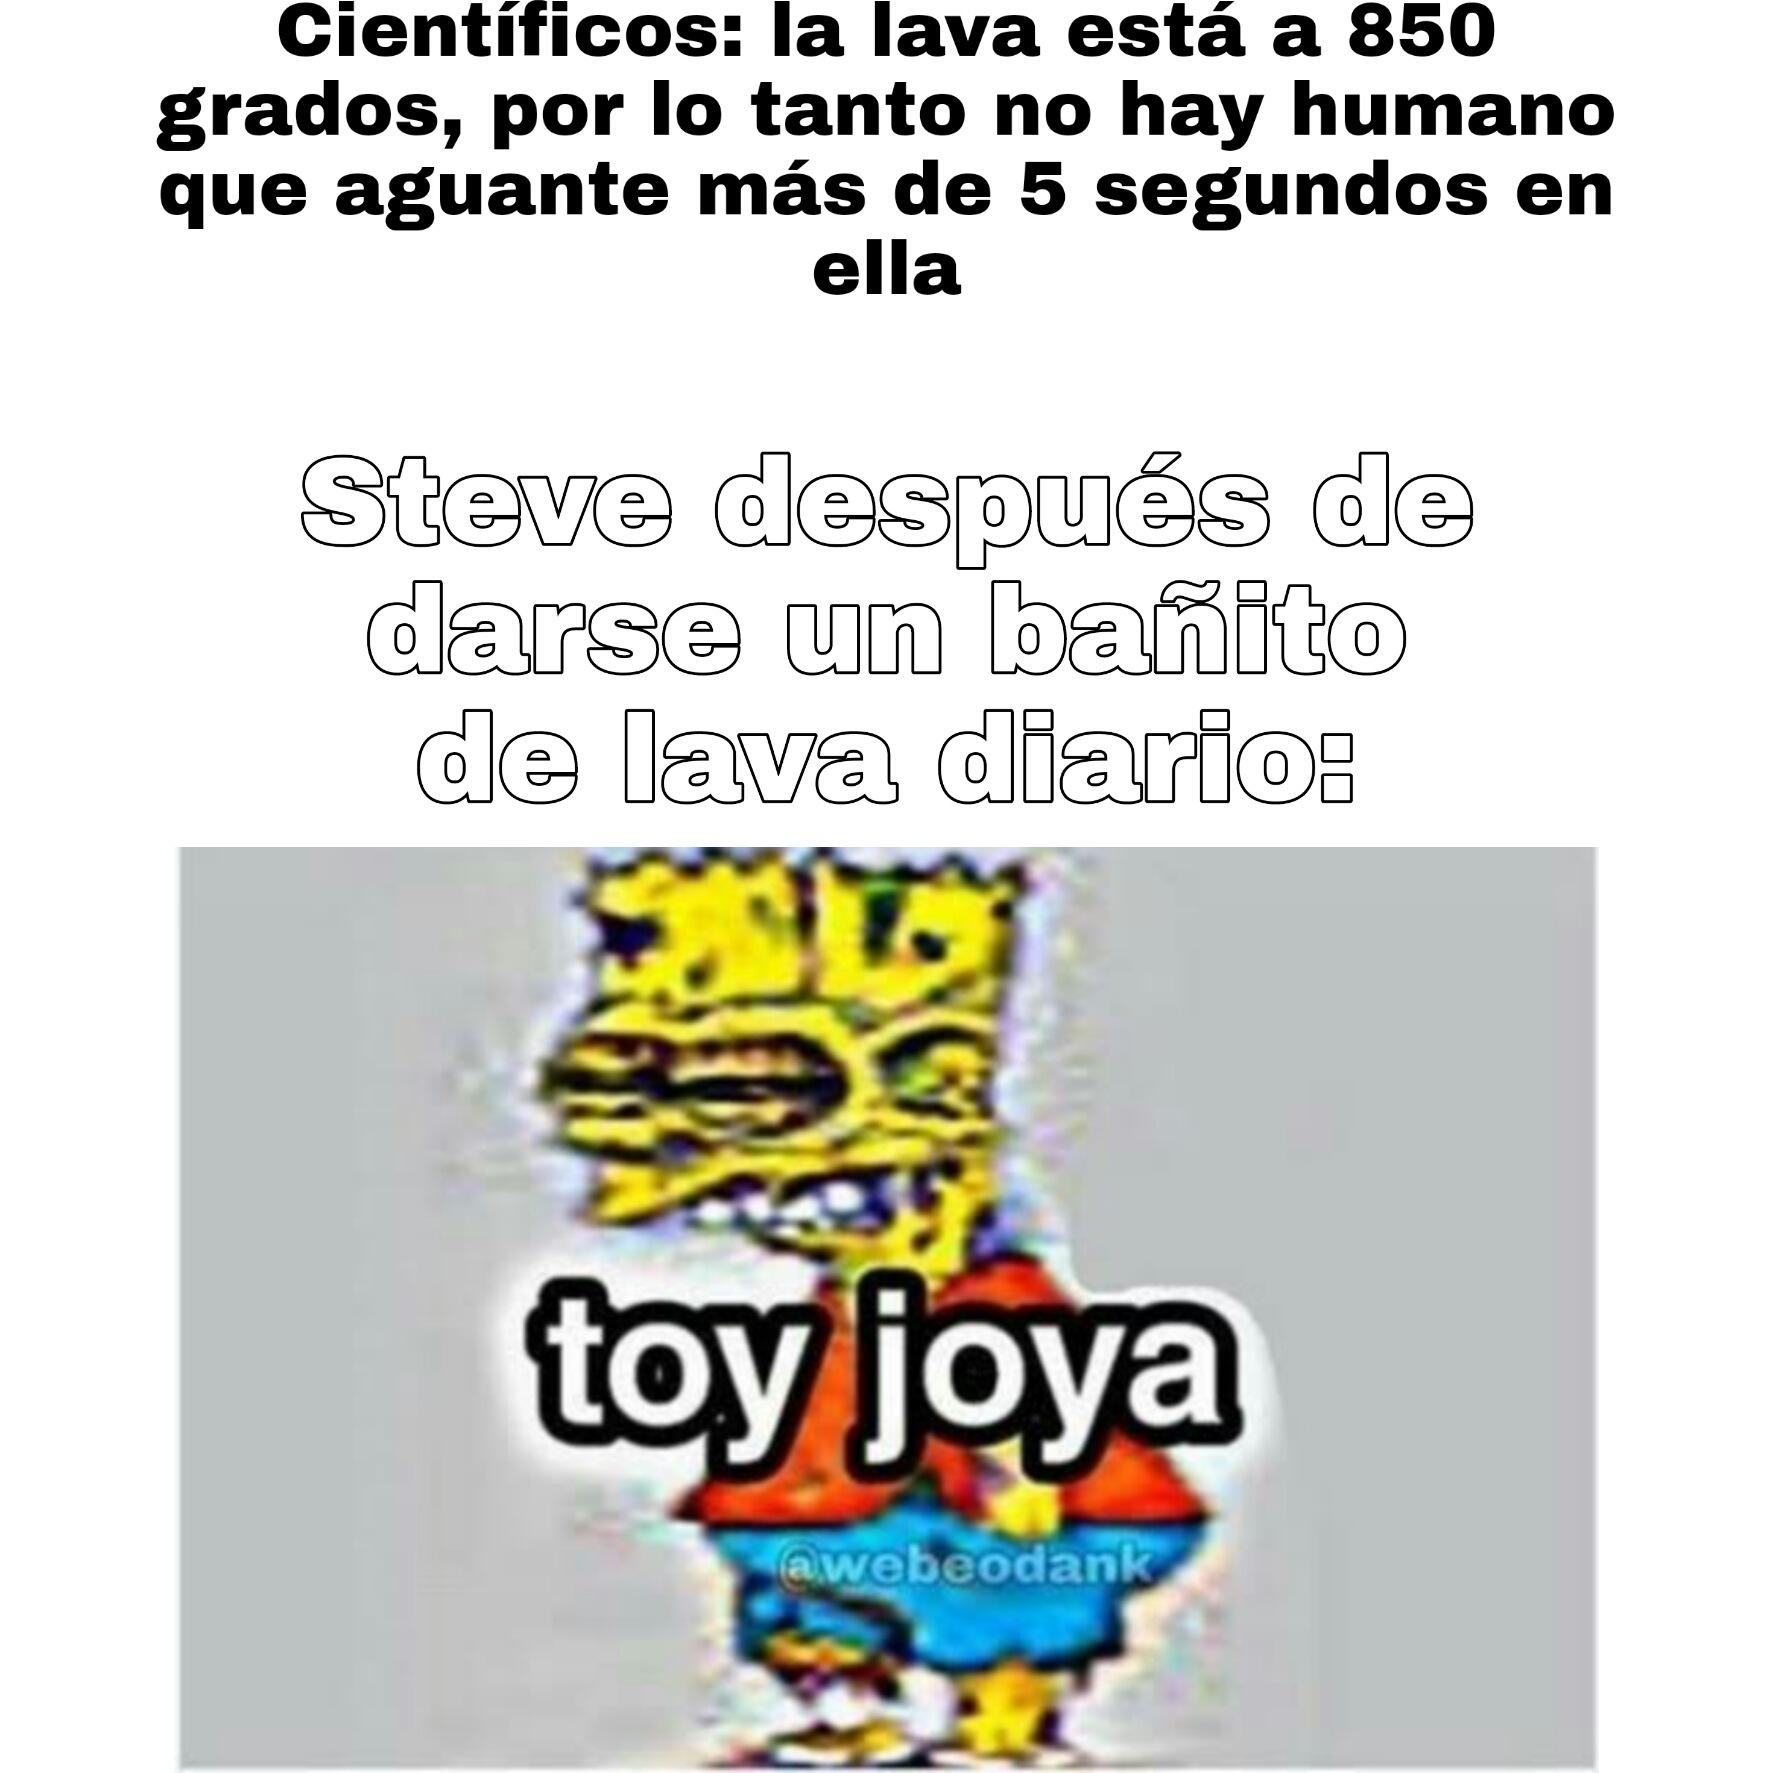 Toy joya - meme